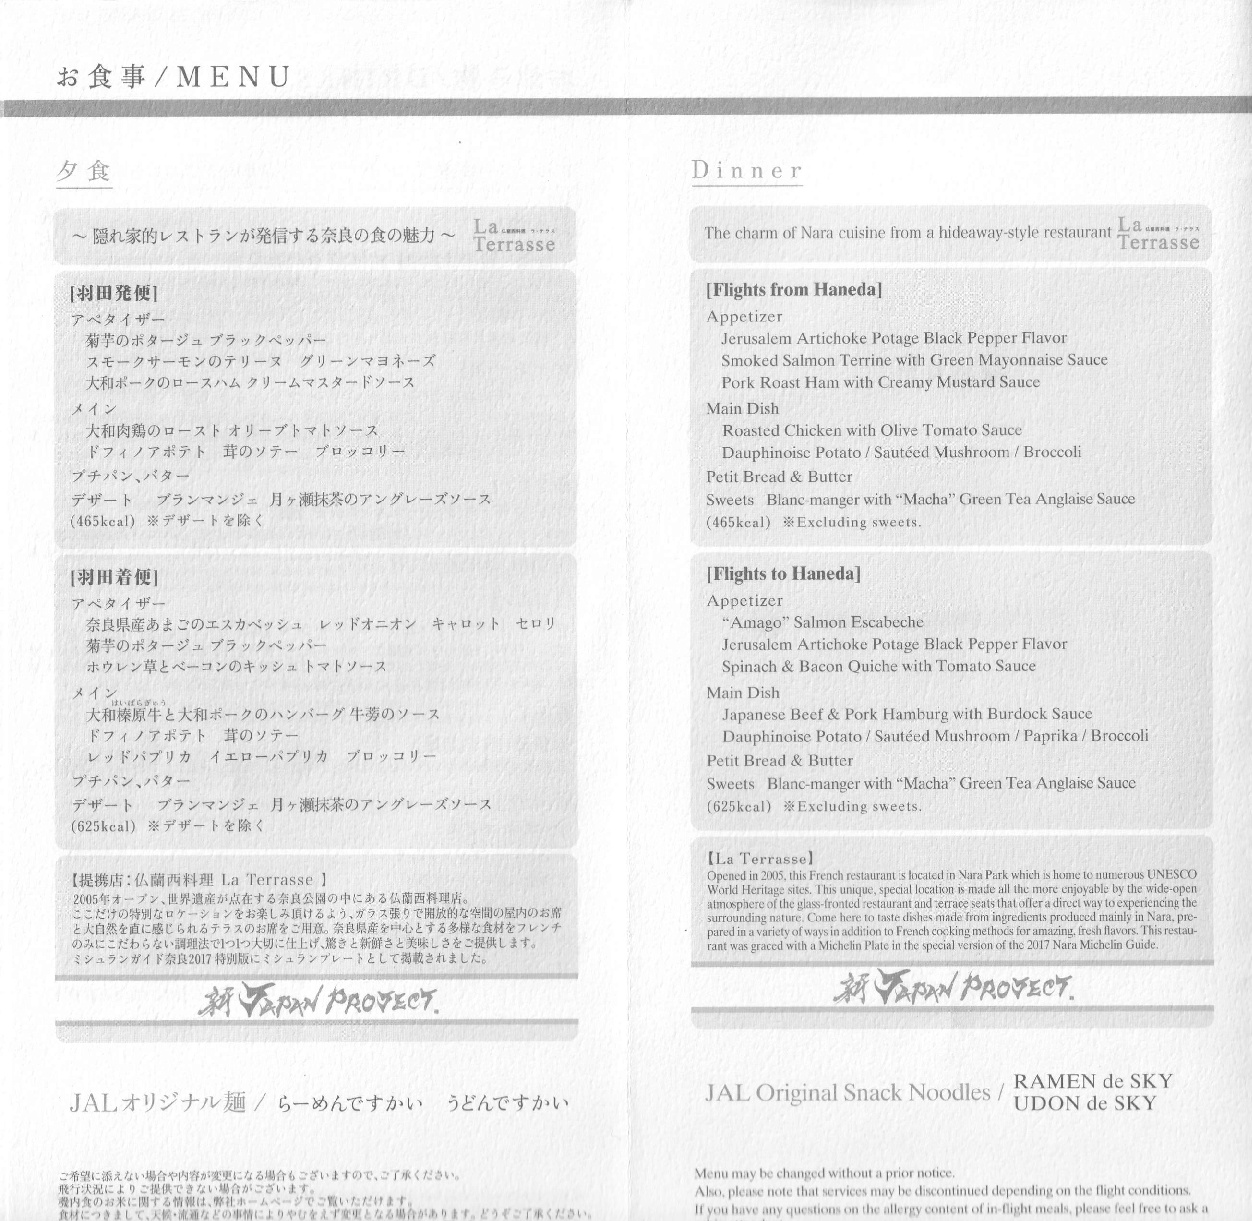 jl_menu_7